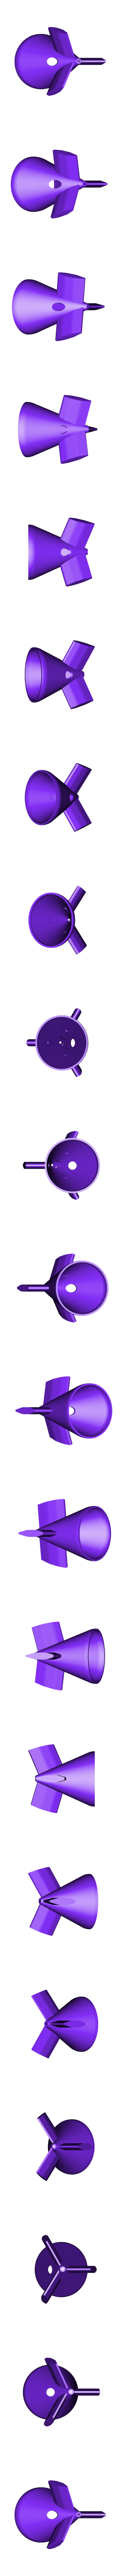 Exhaust-Duct102.stl Download free STL file Turboprop Engine • 3D printable model, konchan77